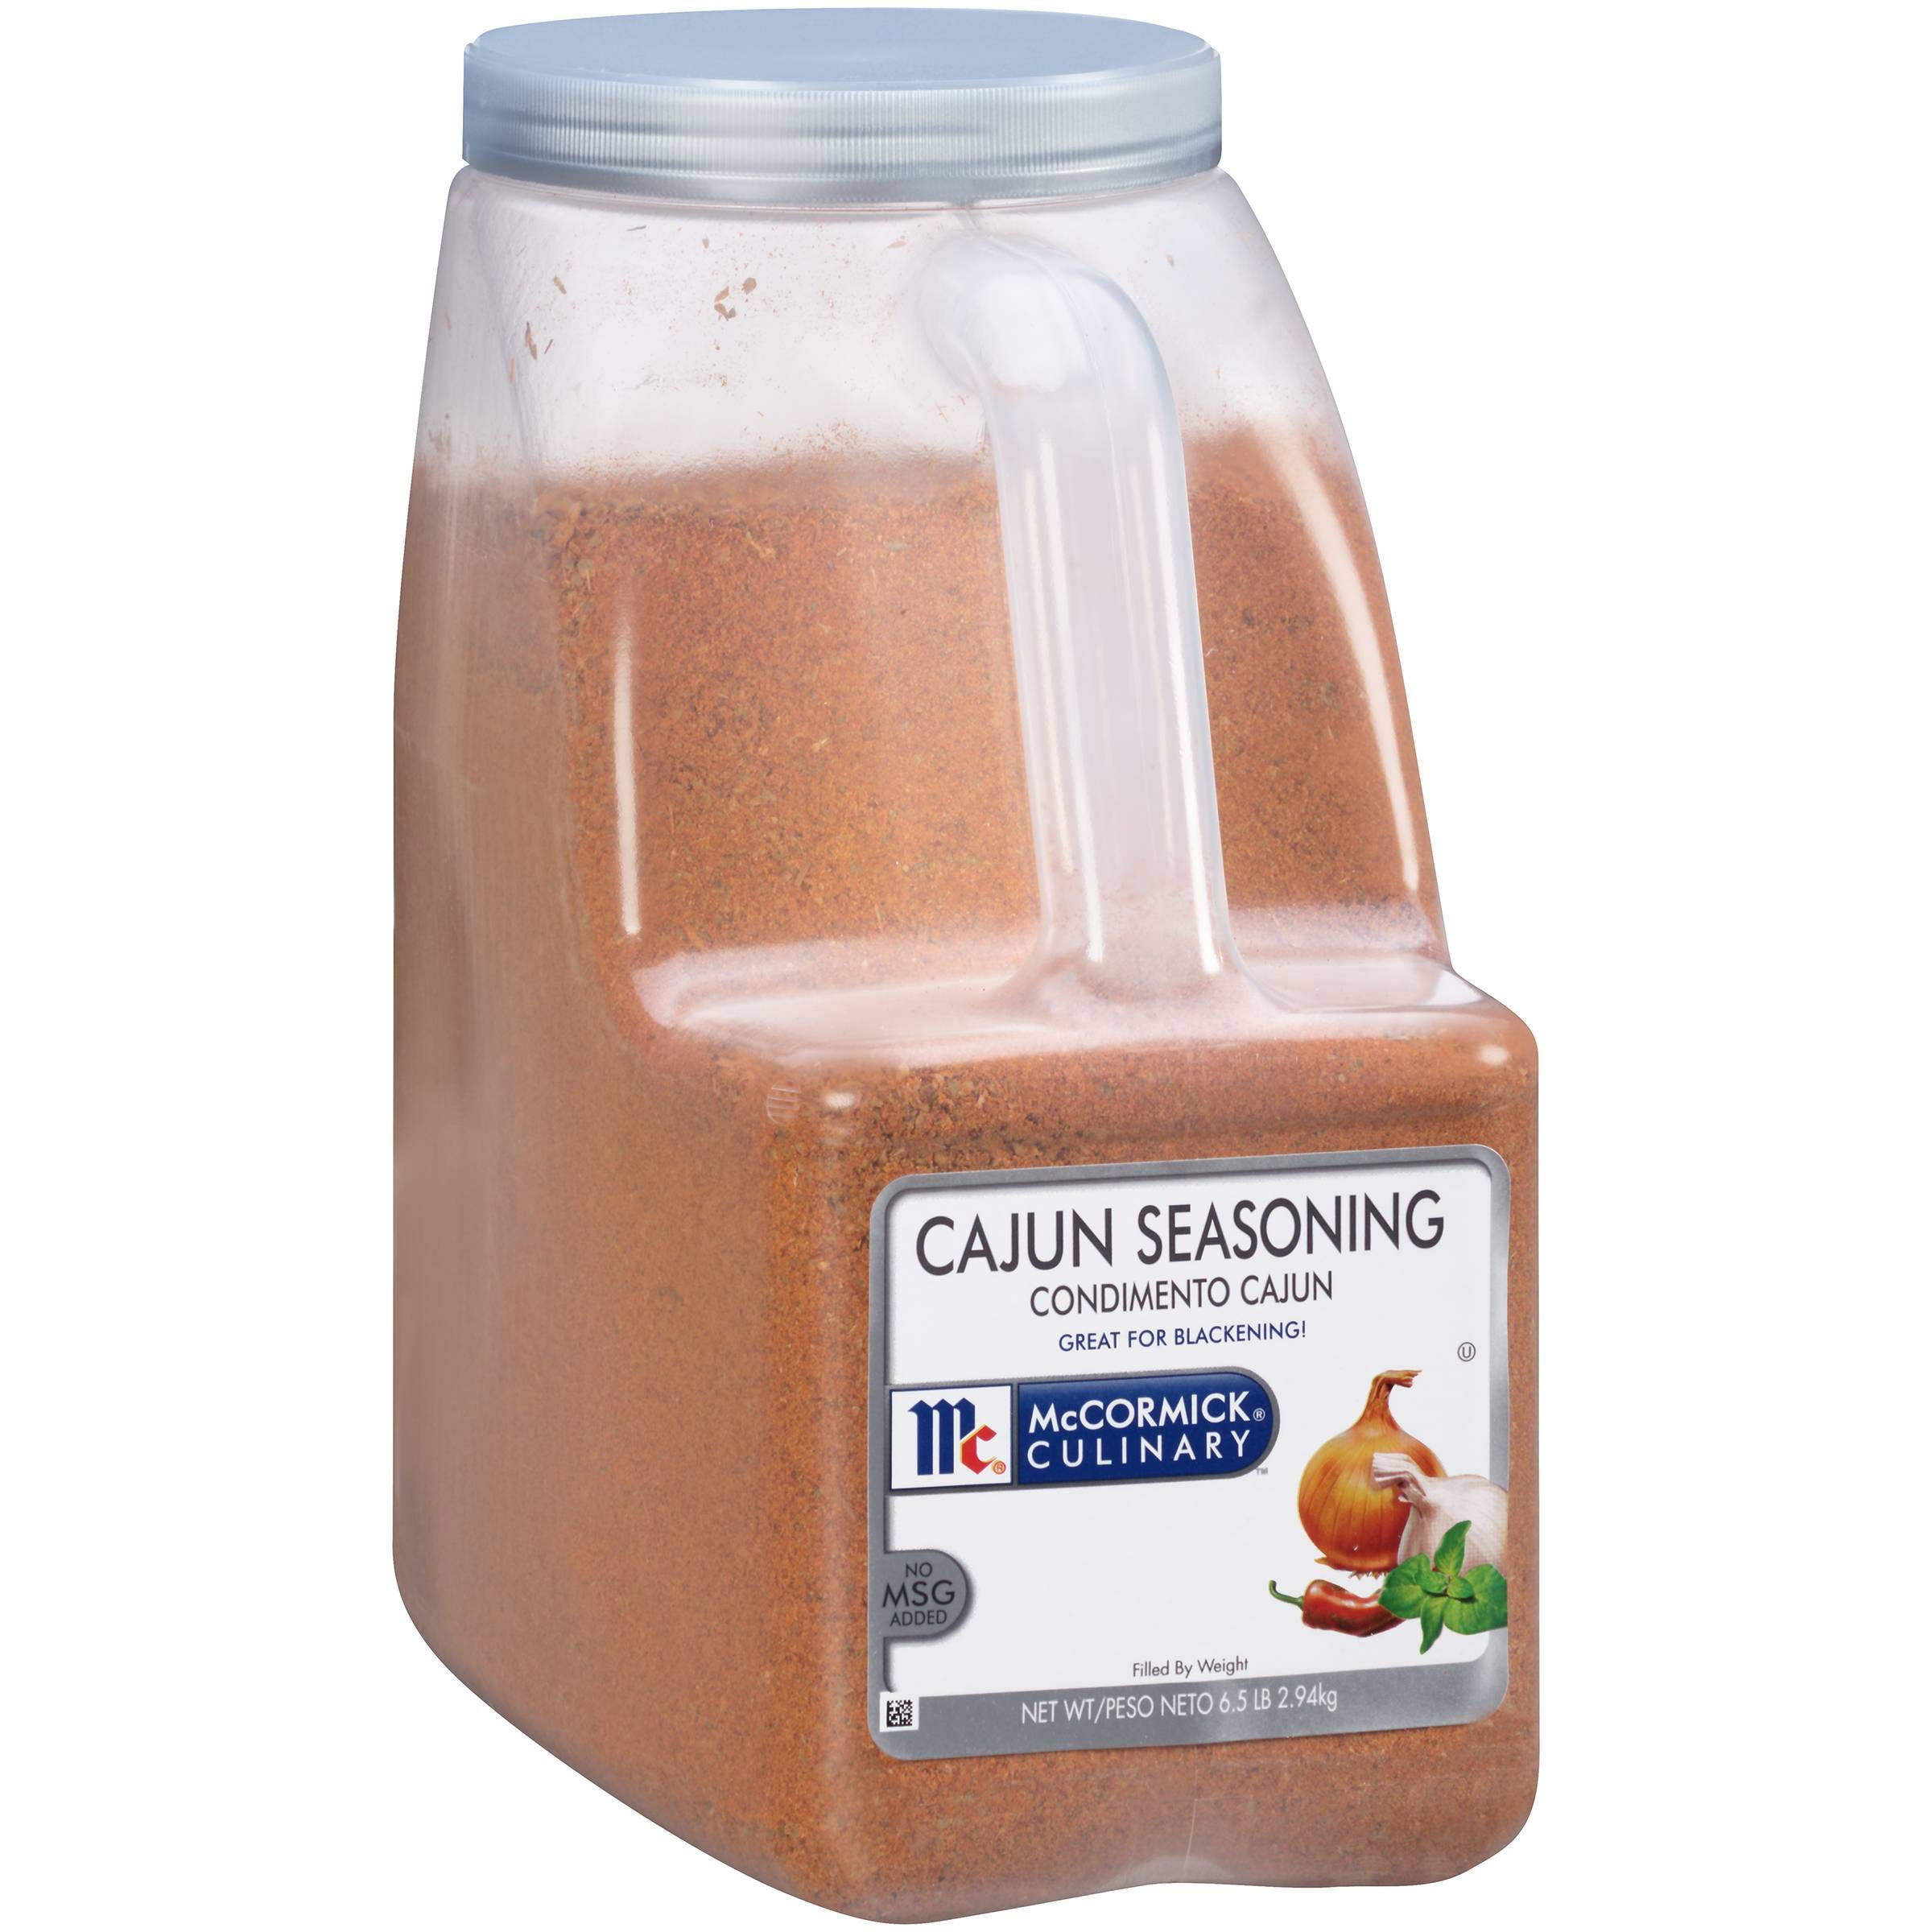 McCormick Cajun Seasoning - 6.5 lb. container, 3 per case by McCormick